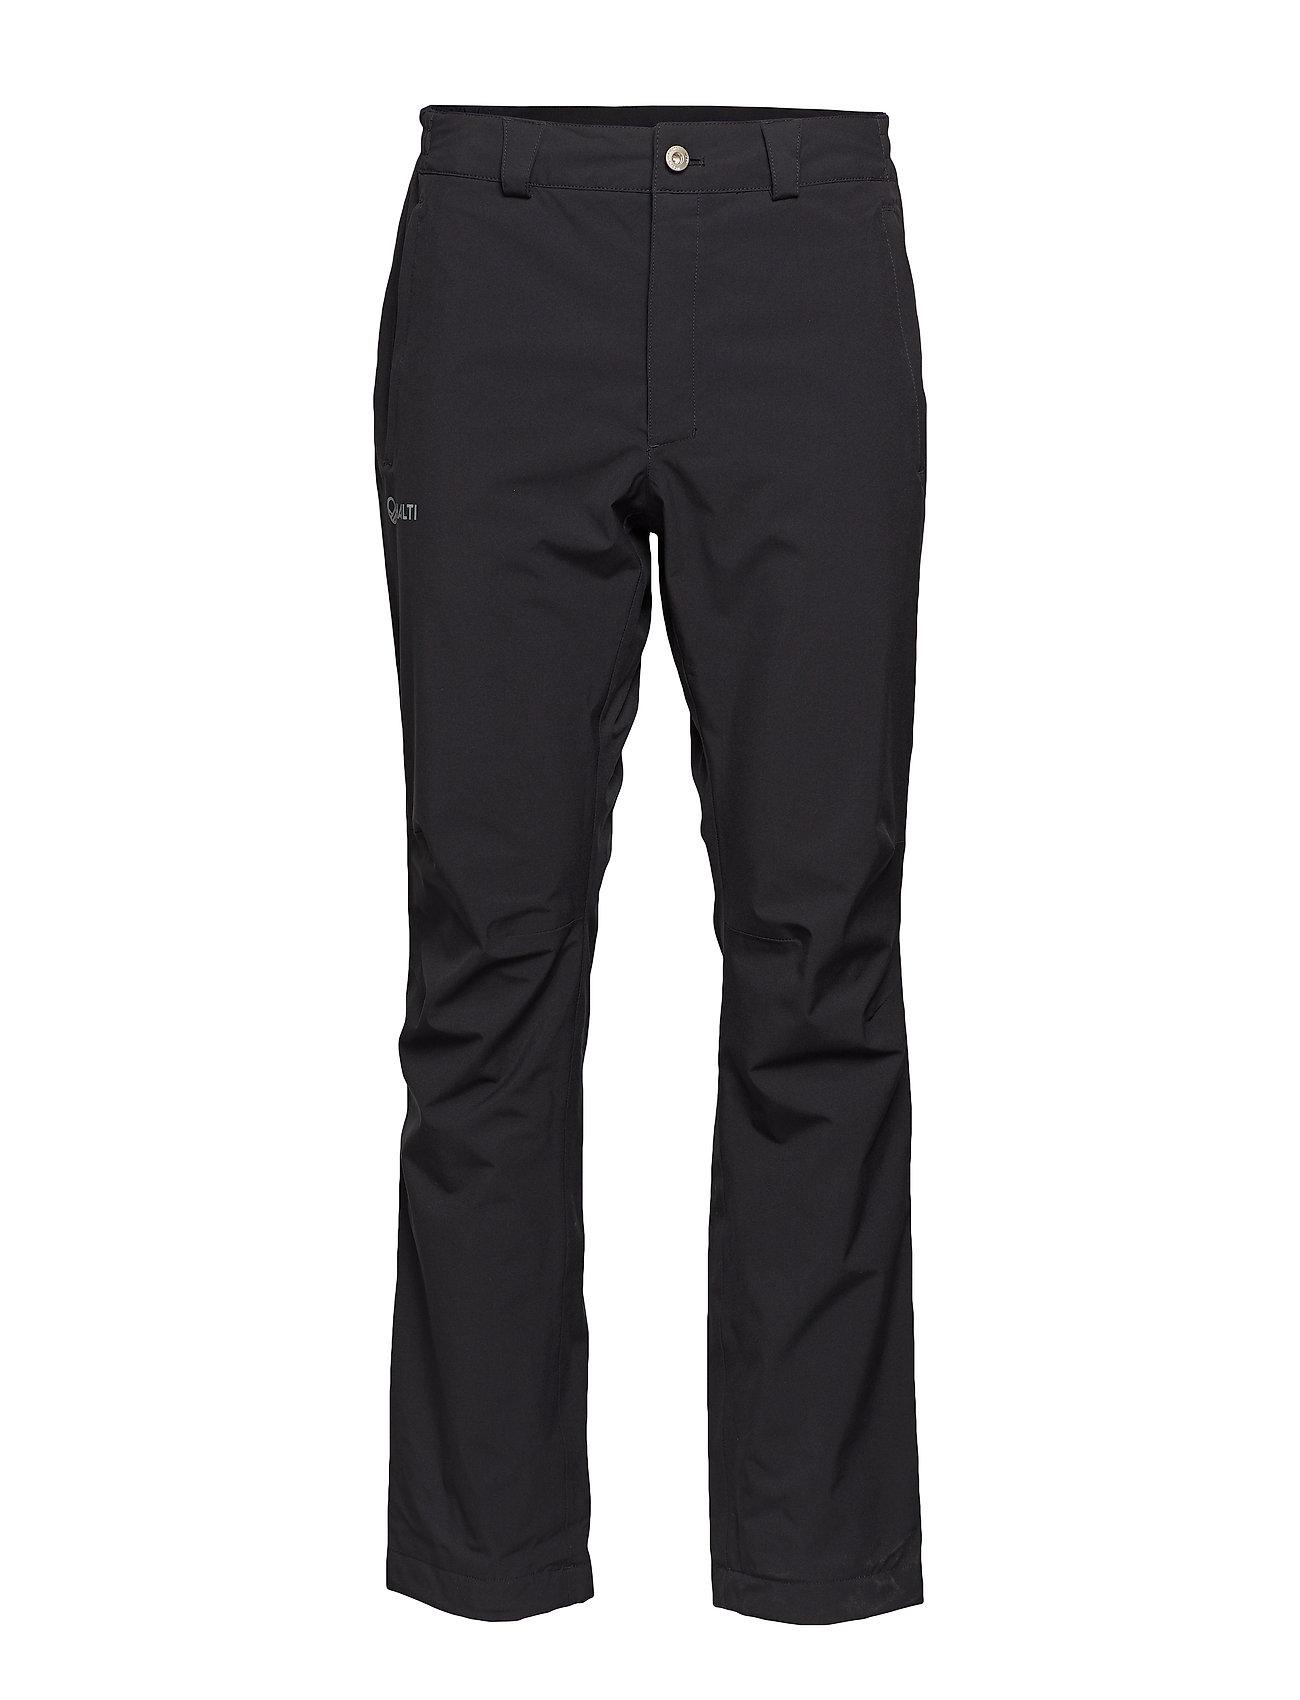 Halti Vuoksi Men's Outdoor Pants